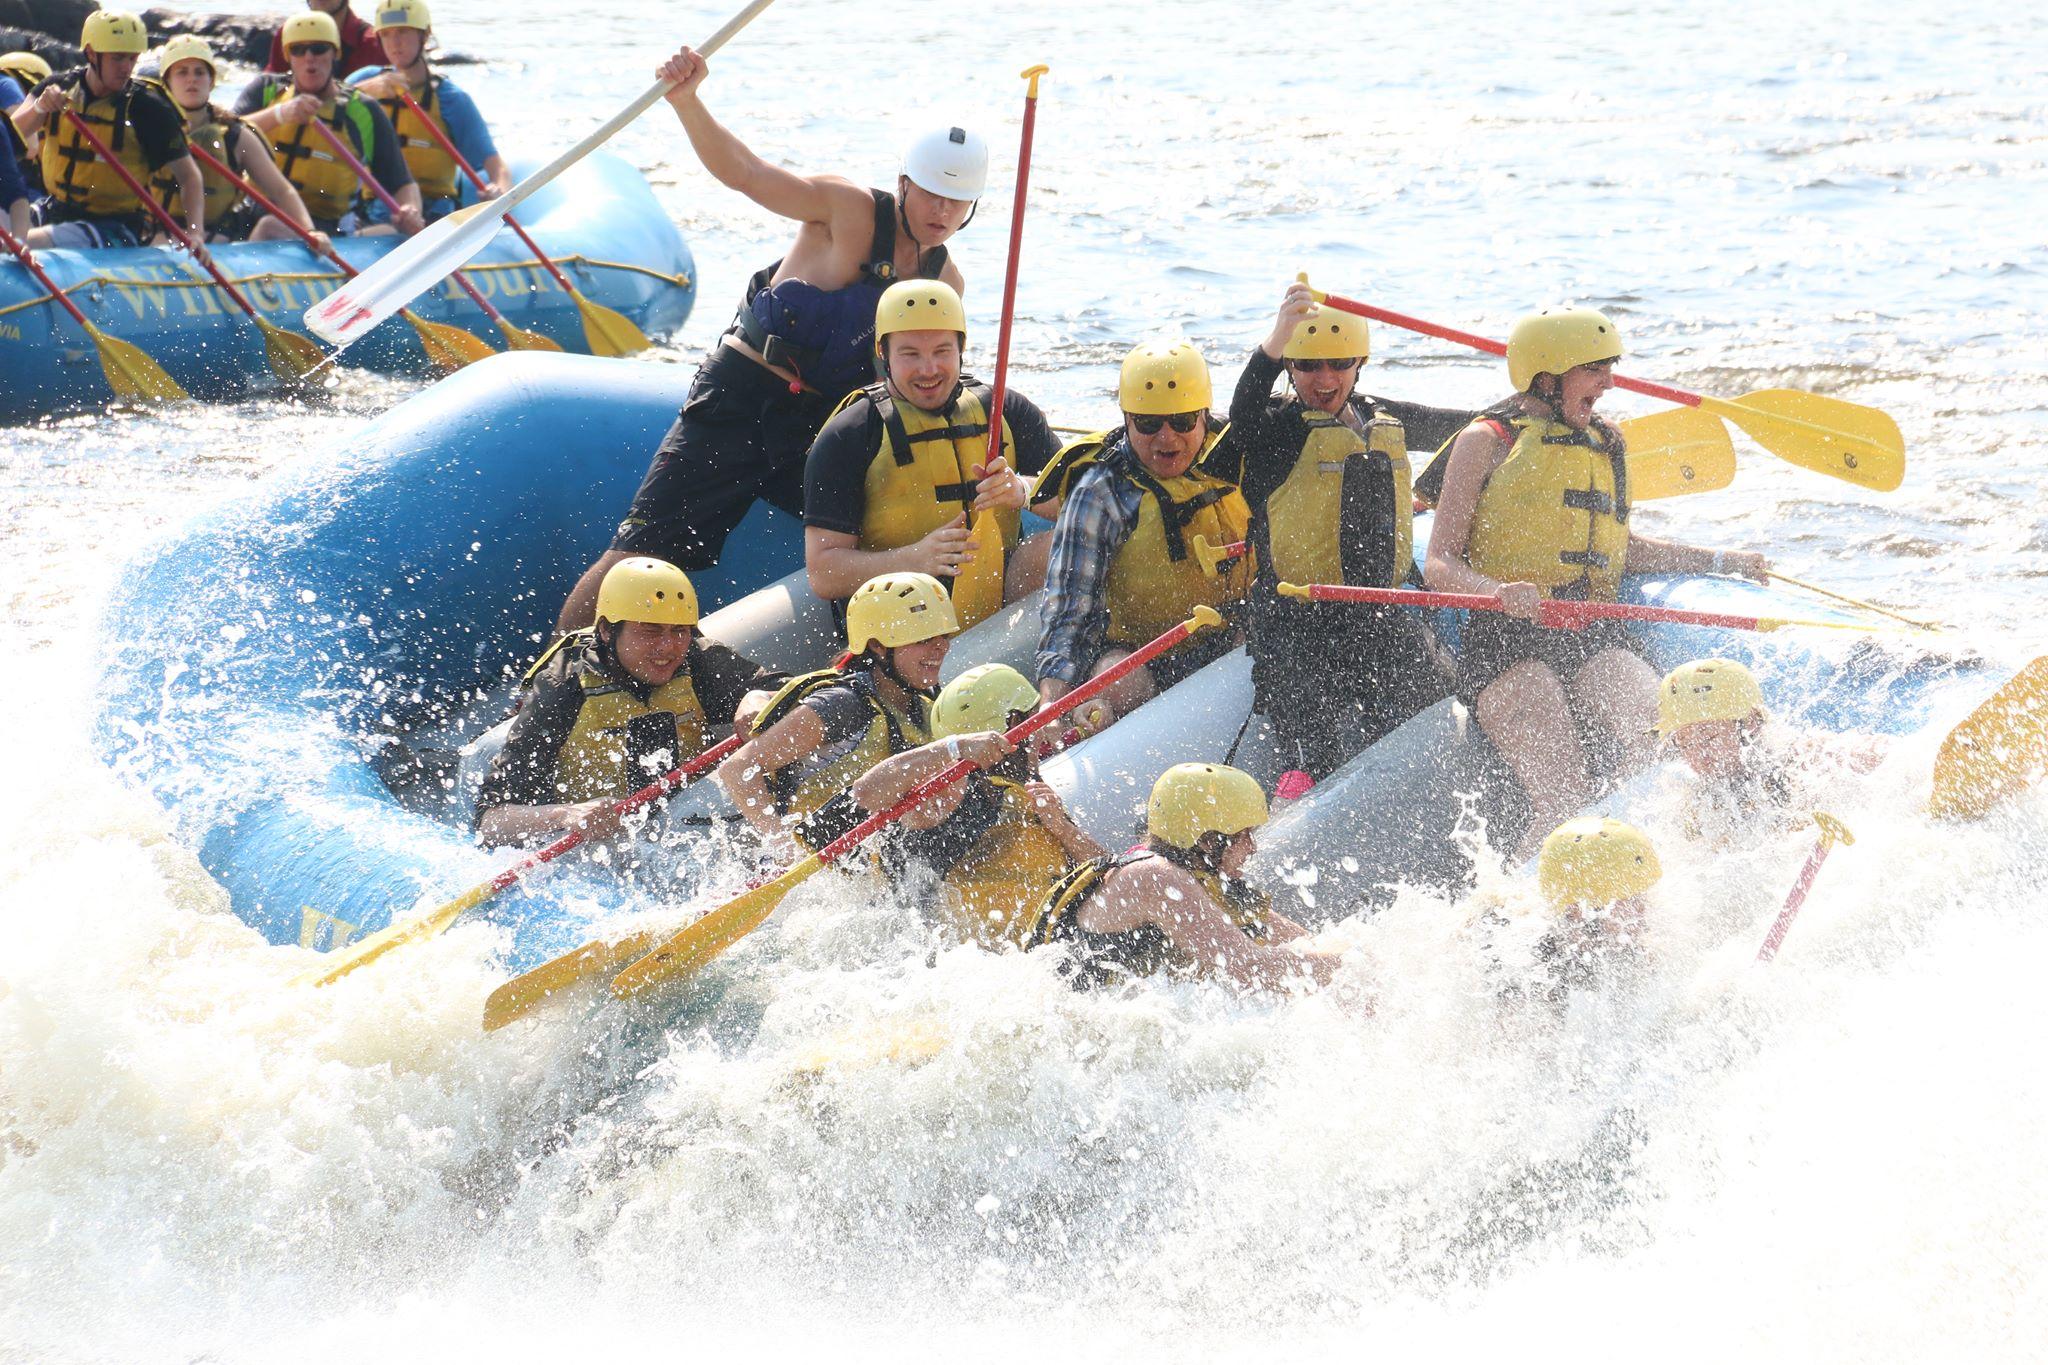 Rafting, Ottawa river, toronto